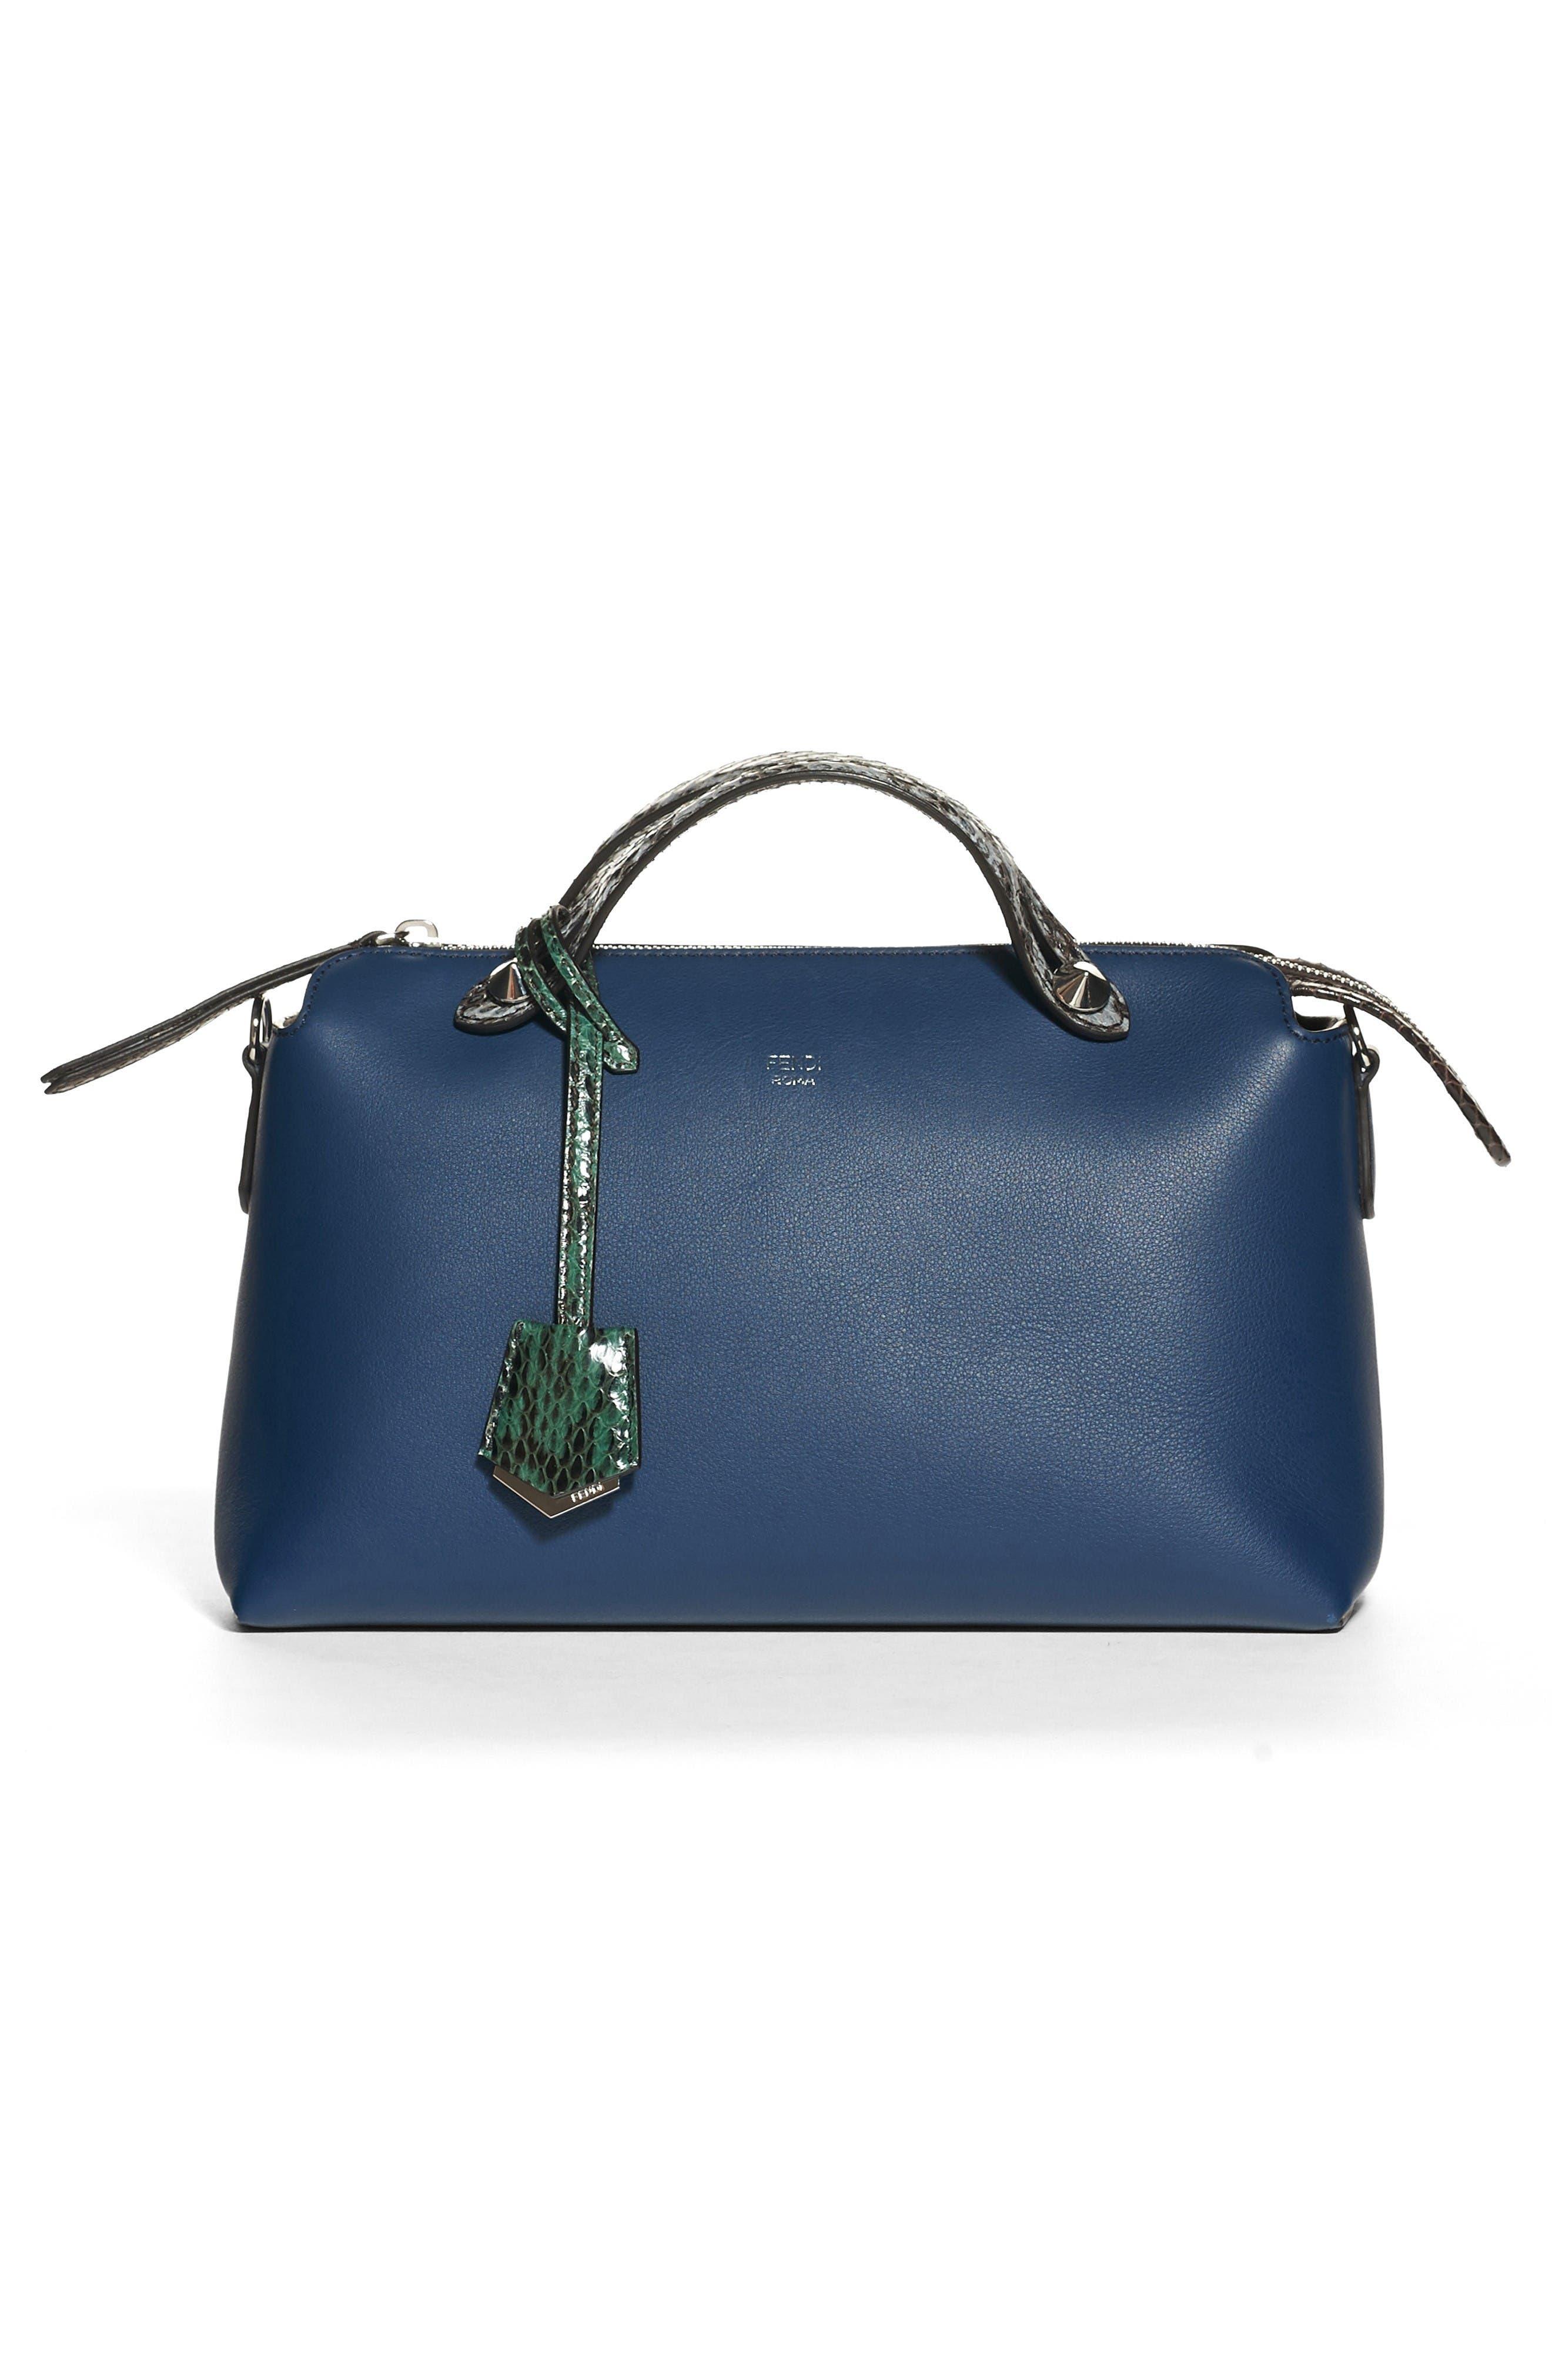 Alternate Image 1 Selected - Fendi 'Medium By the Way' Calfskin Leather Shoulder Bag with Genuine Snakeskin Trim